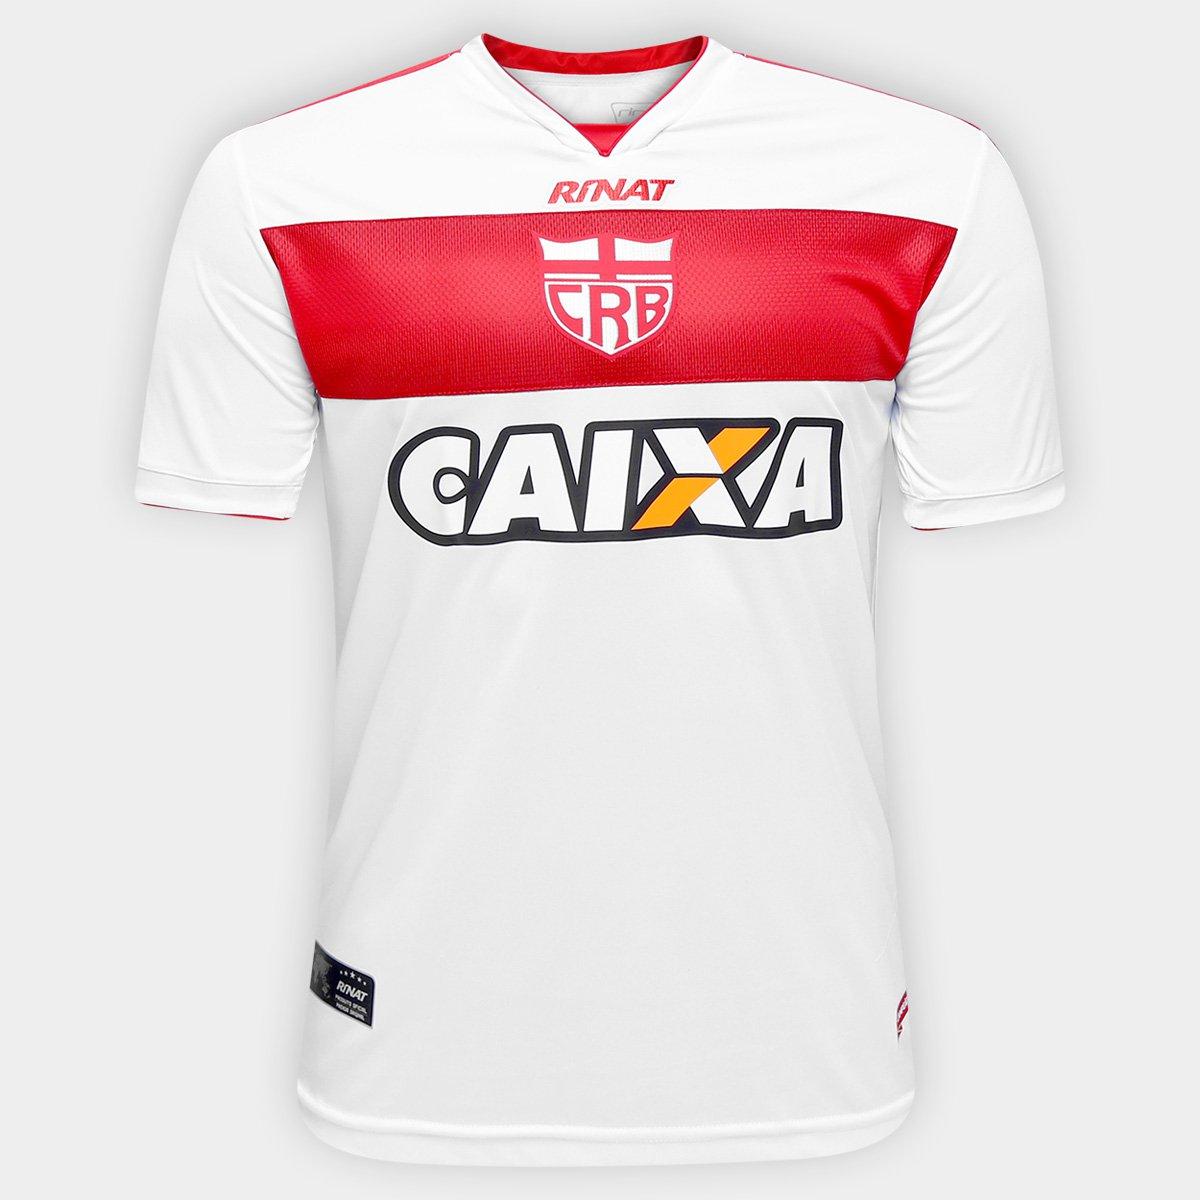 7242281939 Camisa CRB Alagoas I 17 18 s nº Torcedor Rinat Masculina - Compre Agora